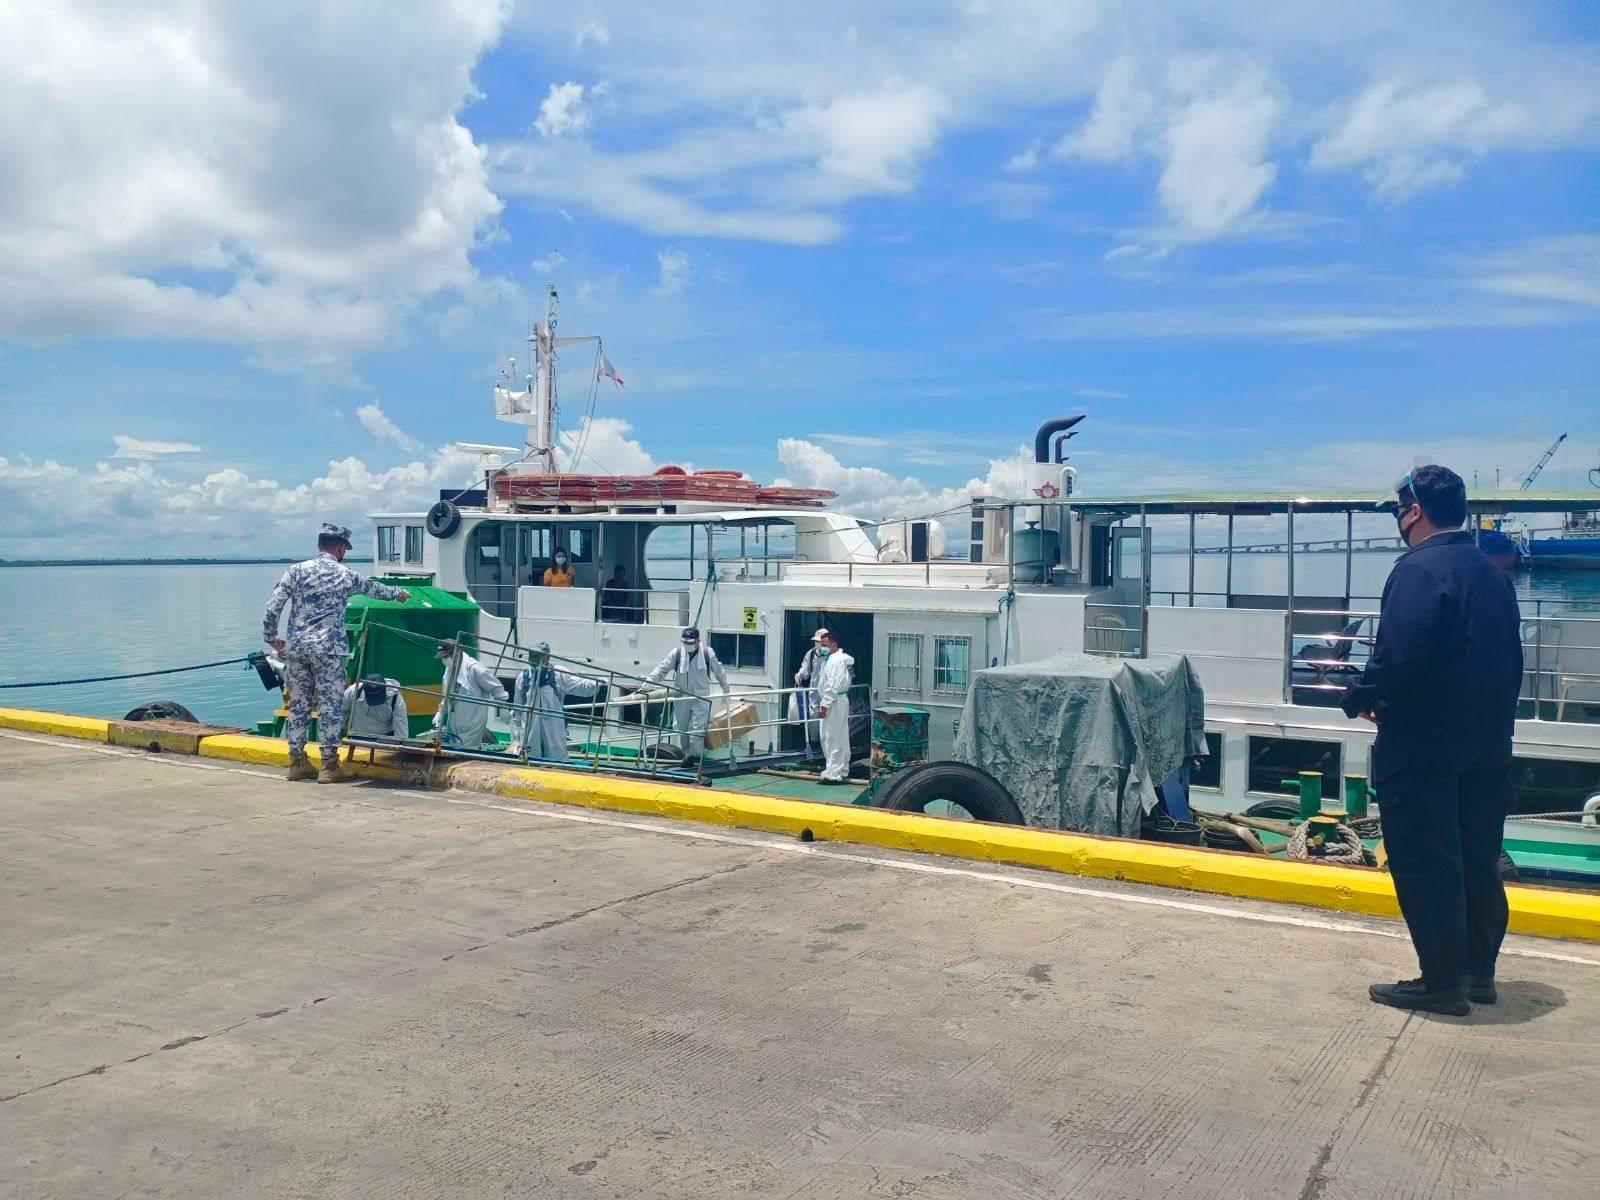 Pinoy seaman Filipino seafarers disembarking ship crew change at port of cebu